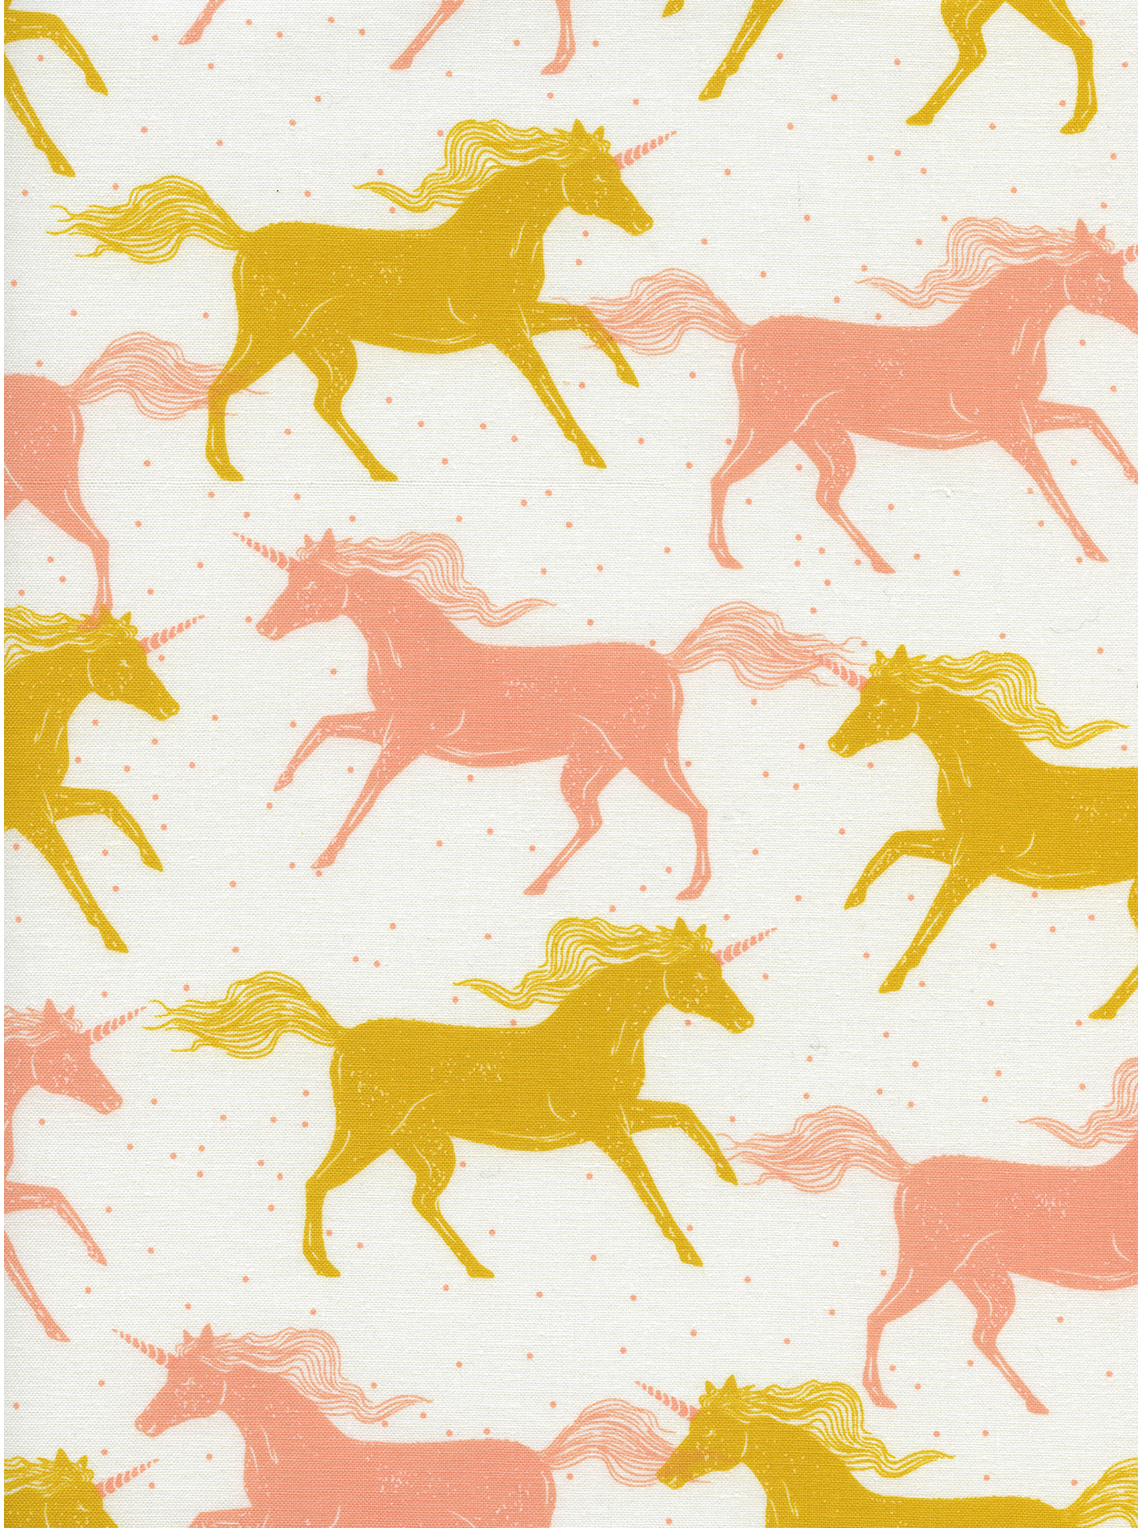 RJR Cotton Steel Basics Magic Forest Unicorns